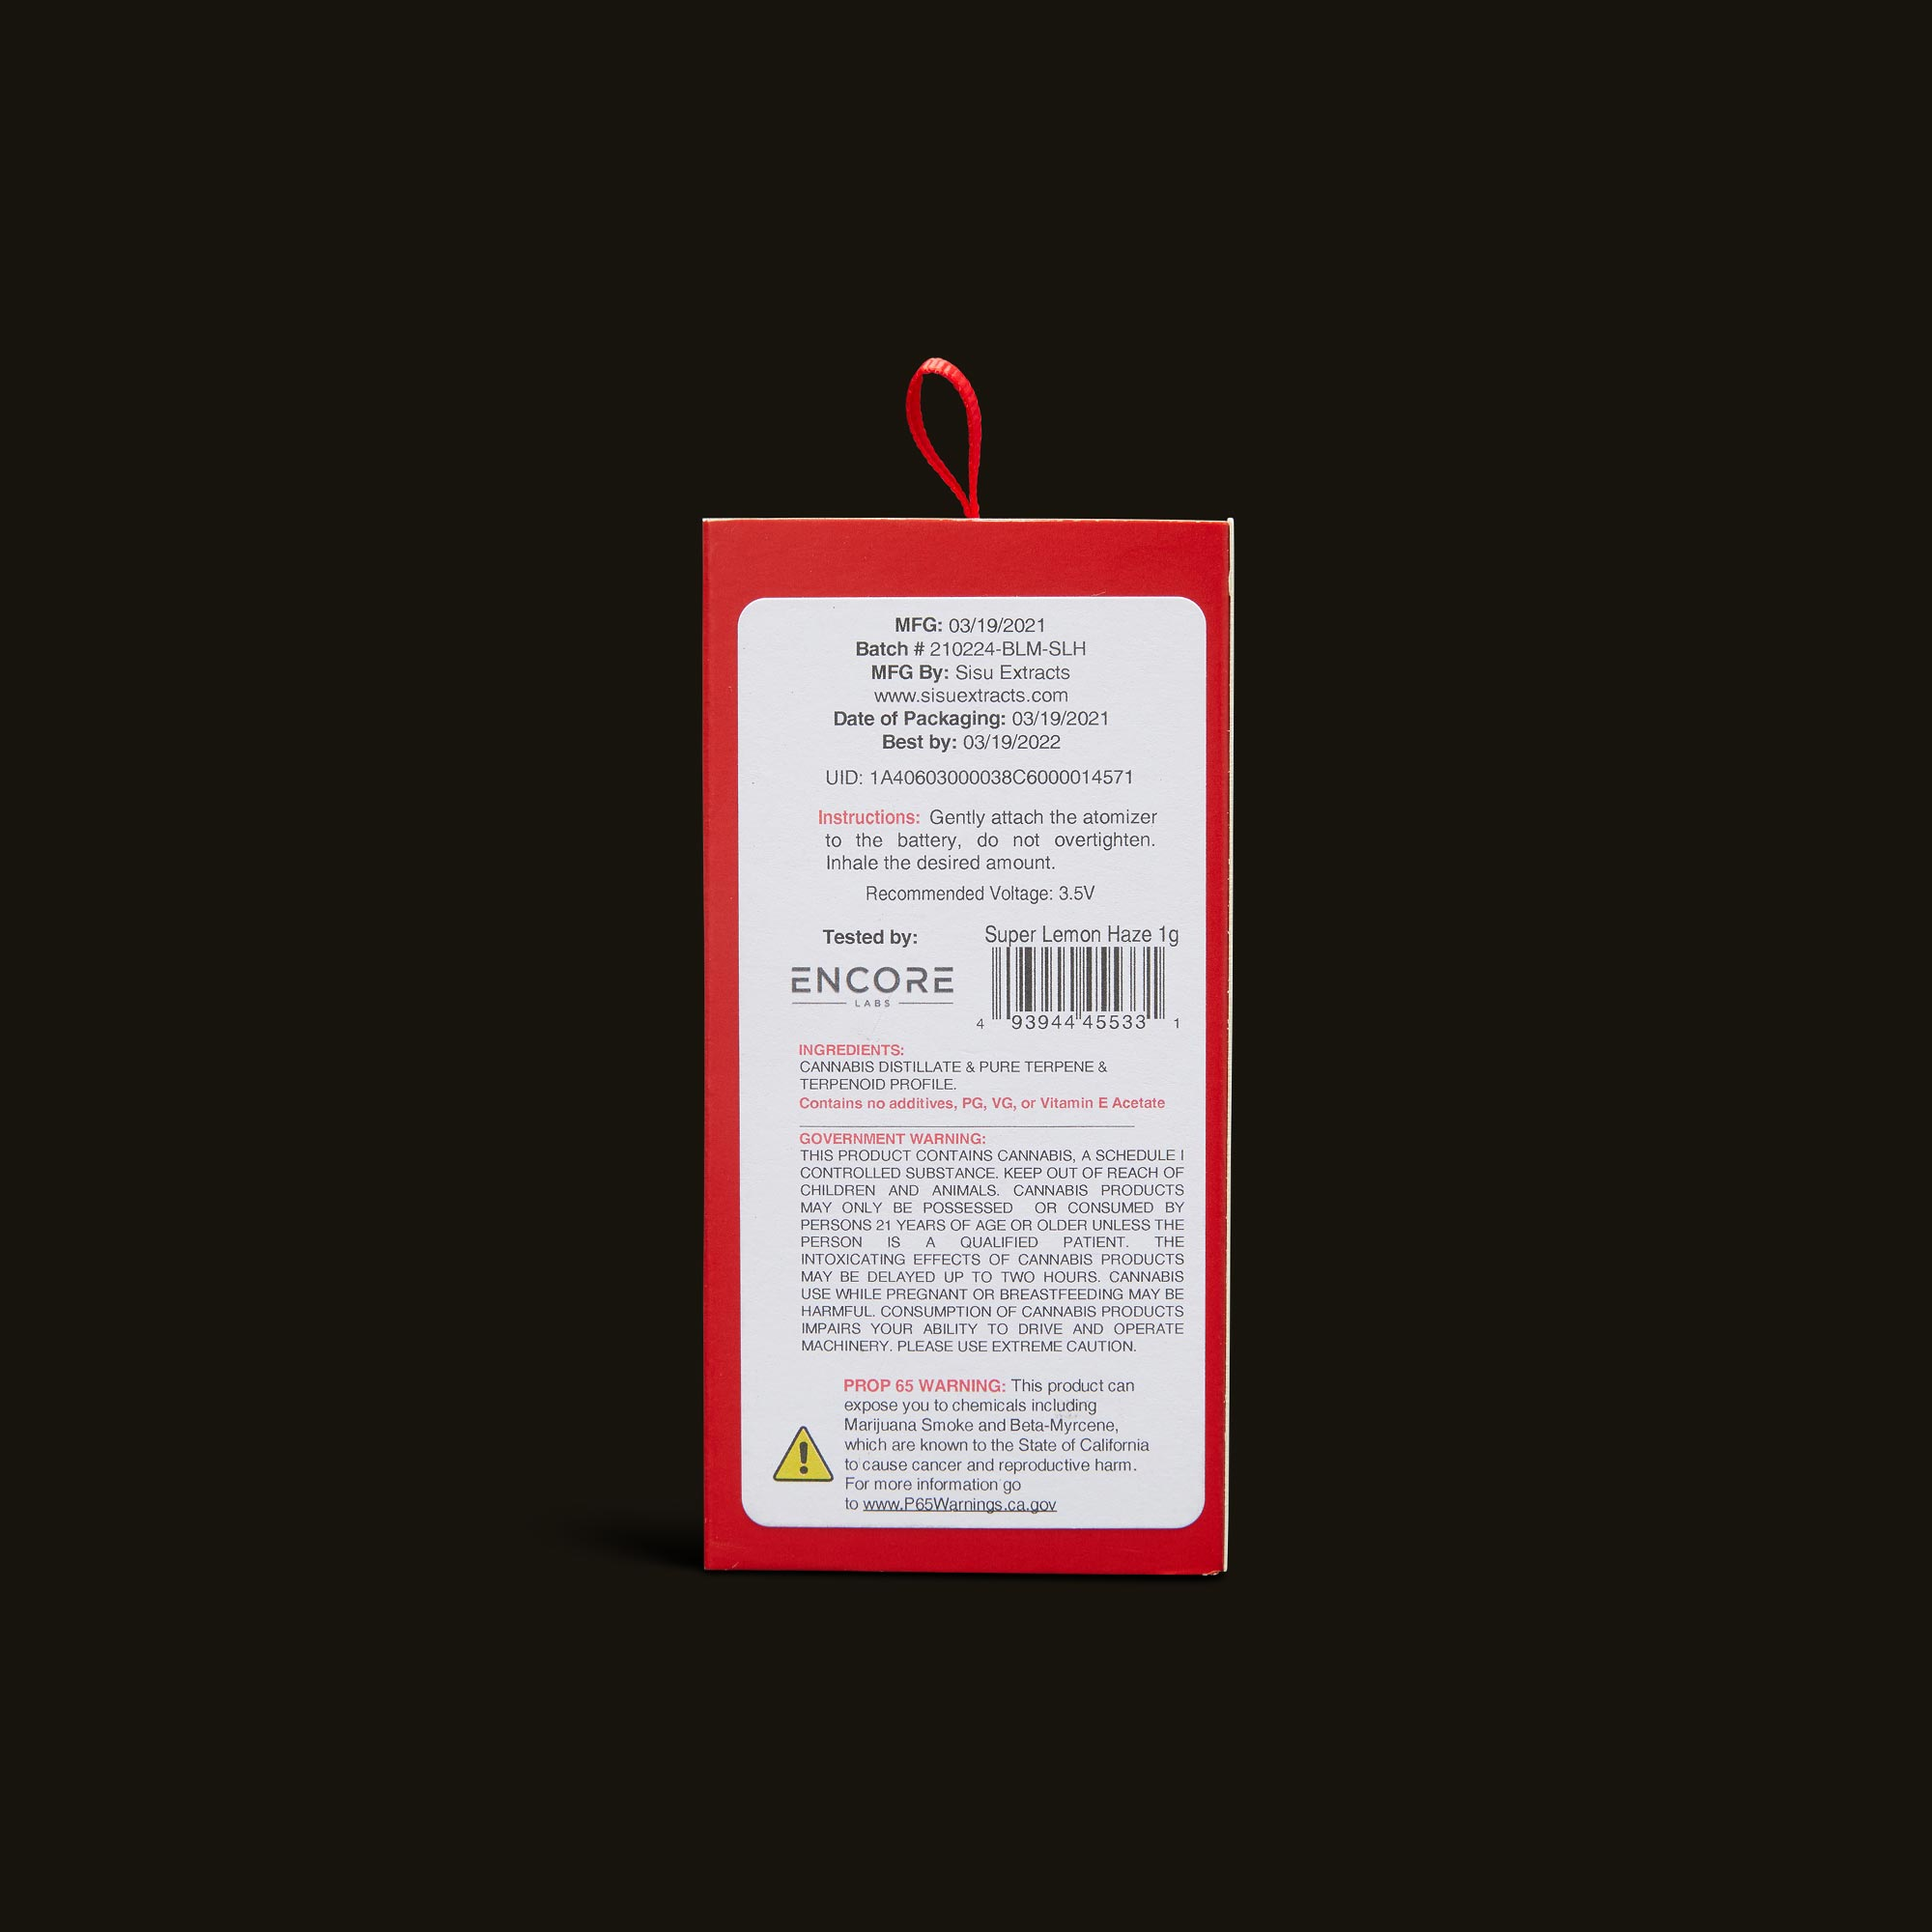 Bloom Brands Vape Pen - Super Lemon Haze Cartridge - 1g